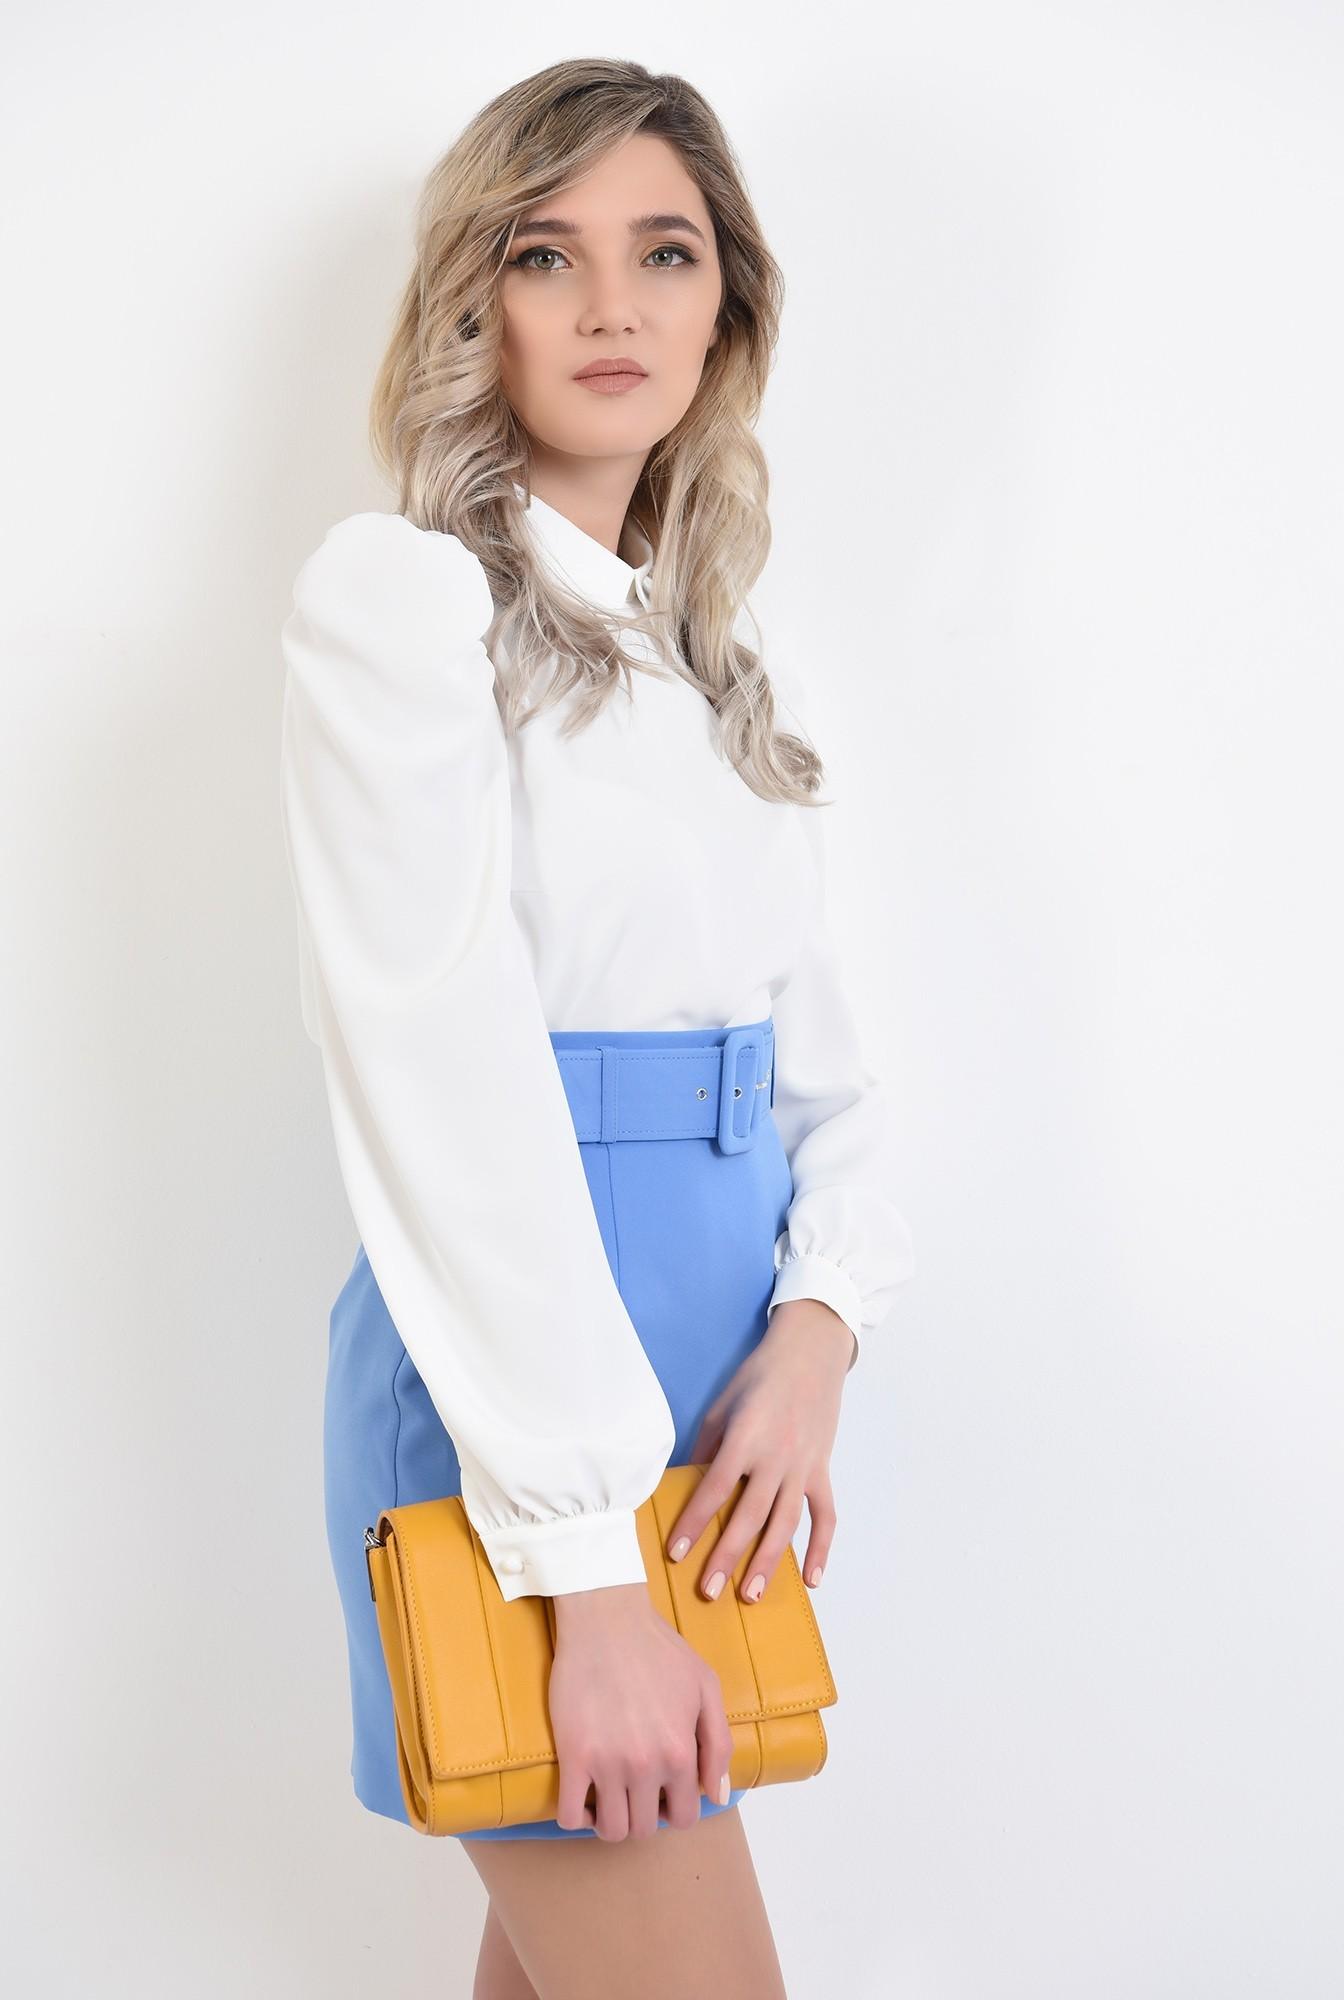 2 - bluza office, maneca lunga, guler rotunjit, ivoar, bluza de primavara